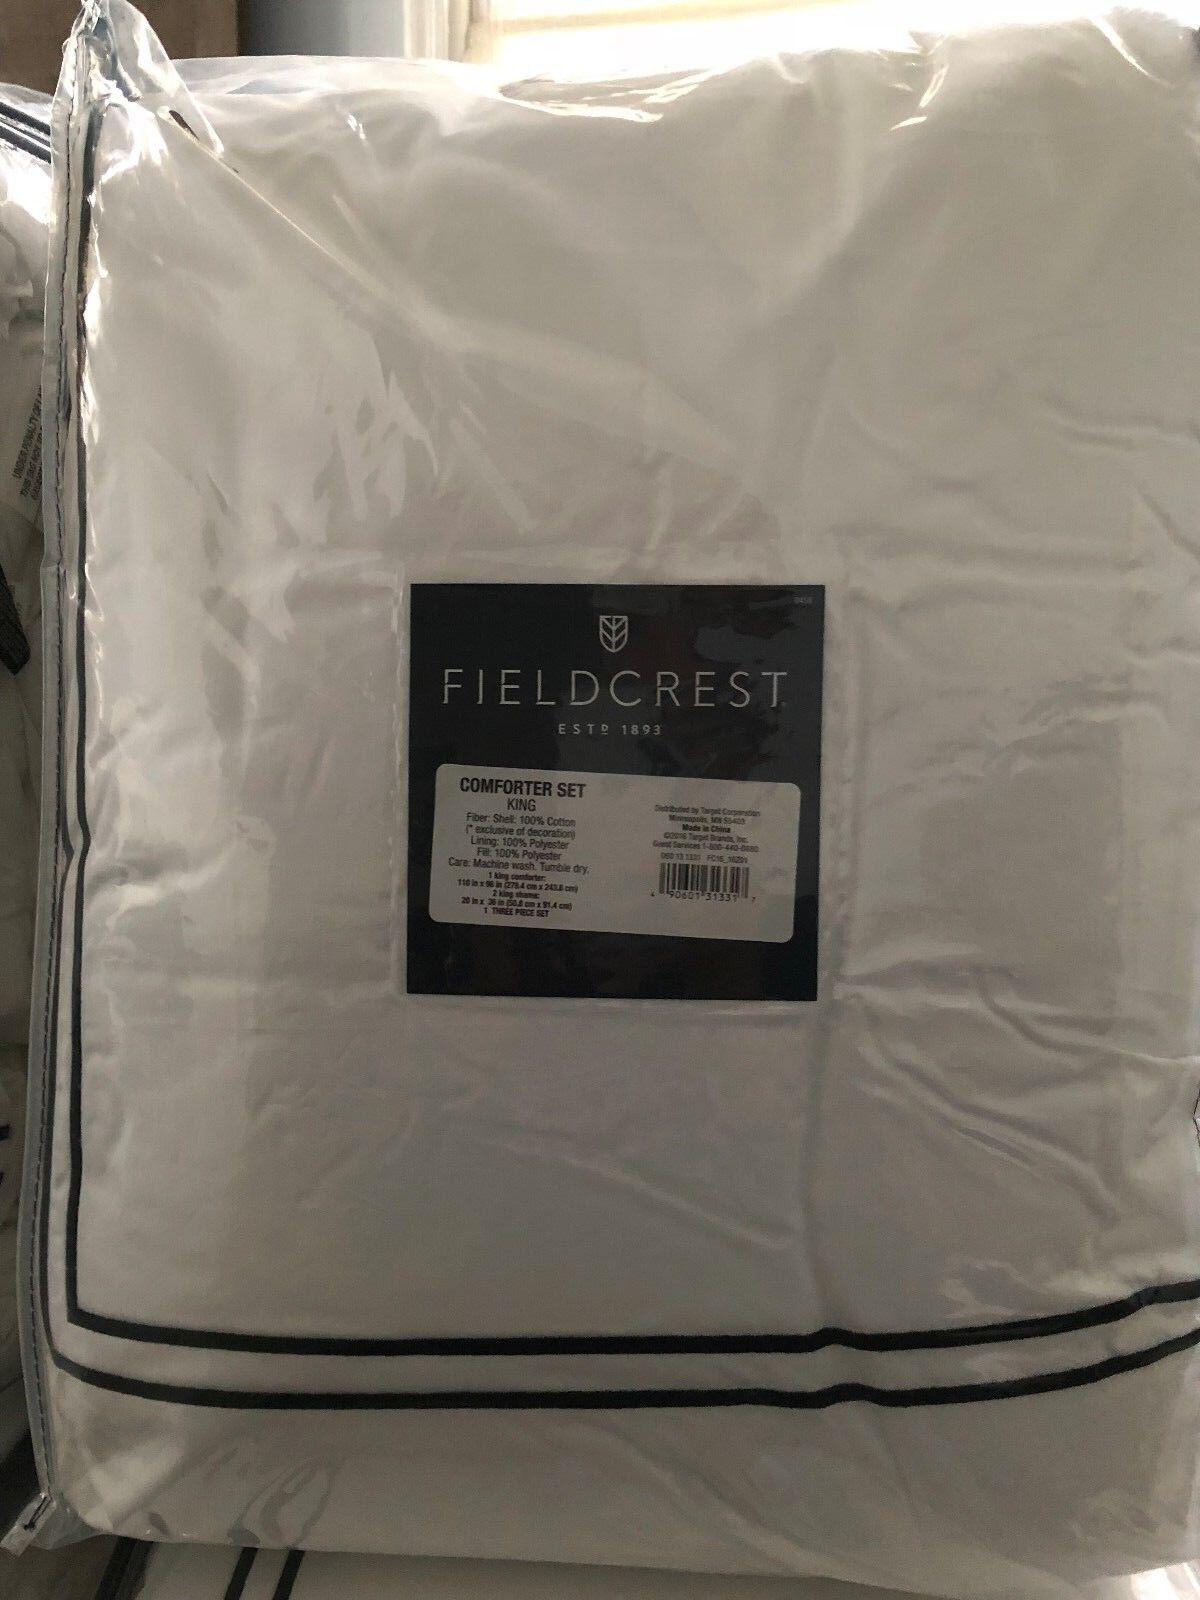 Classic Hotel Comforter Set - Fieldcrest King Size